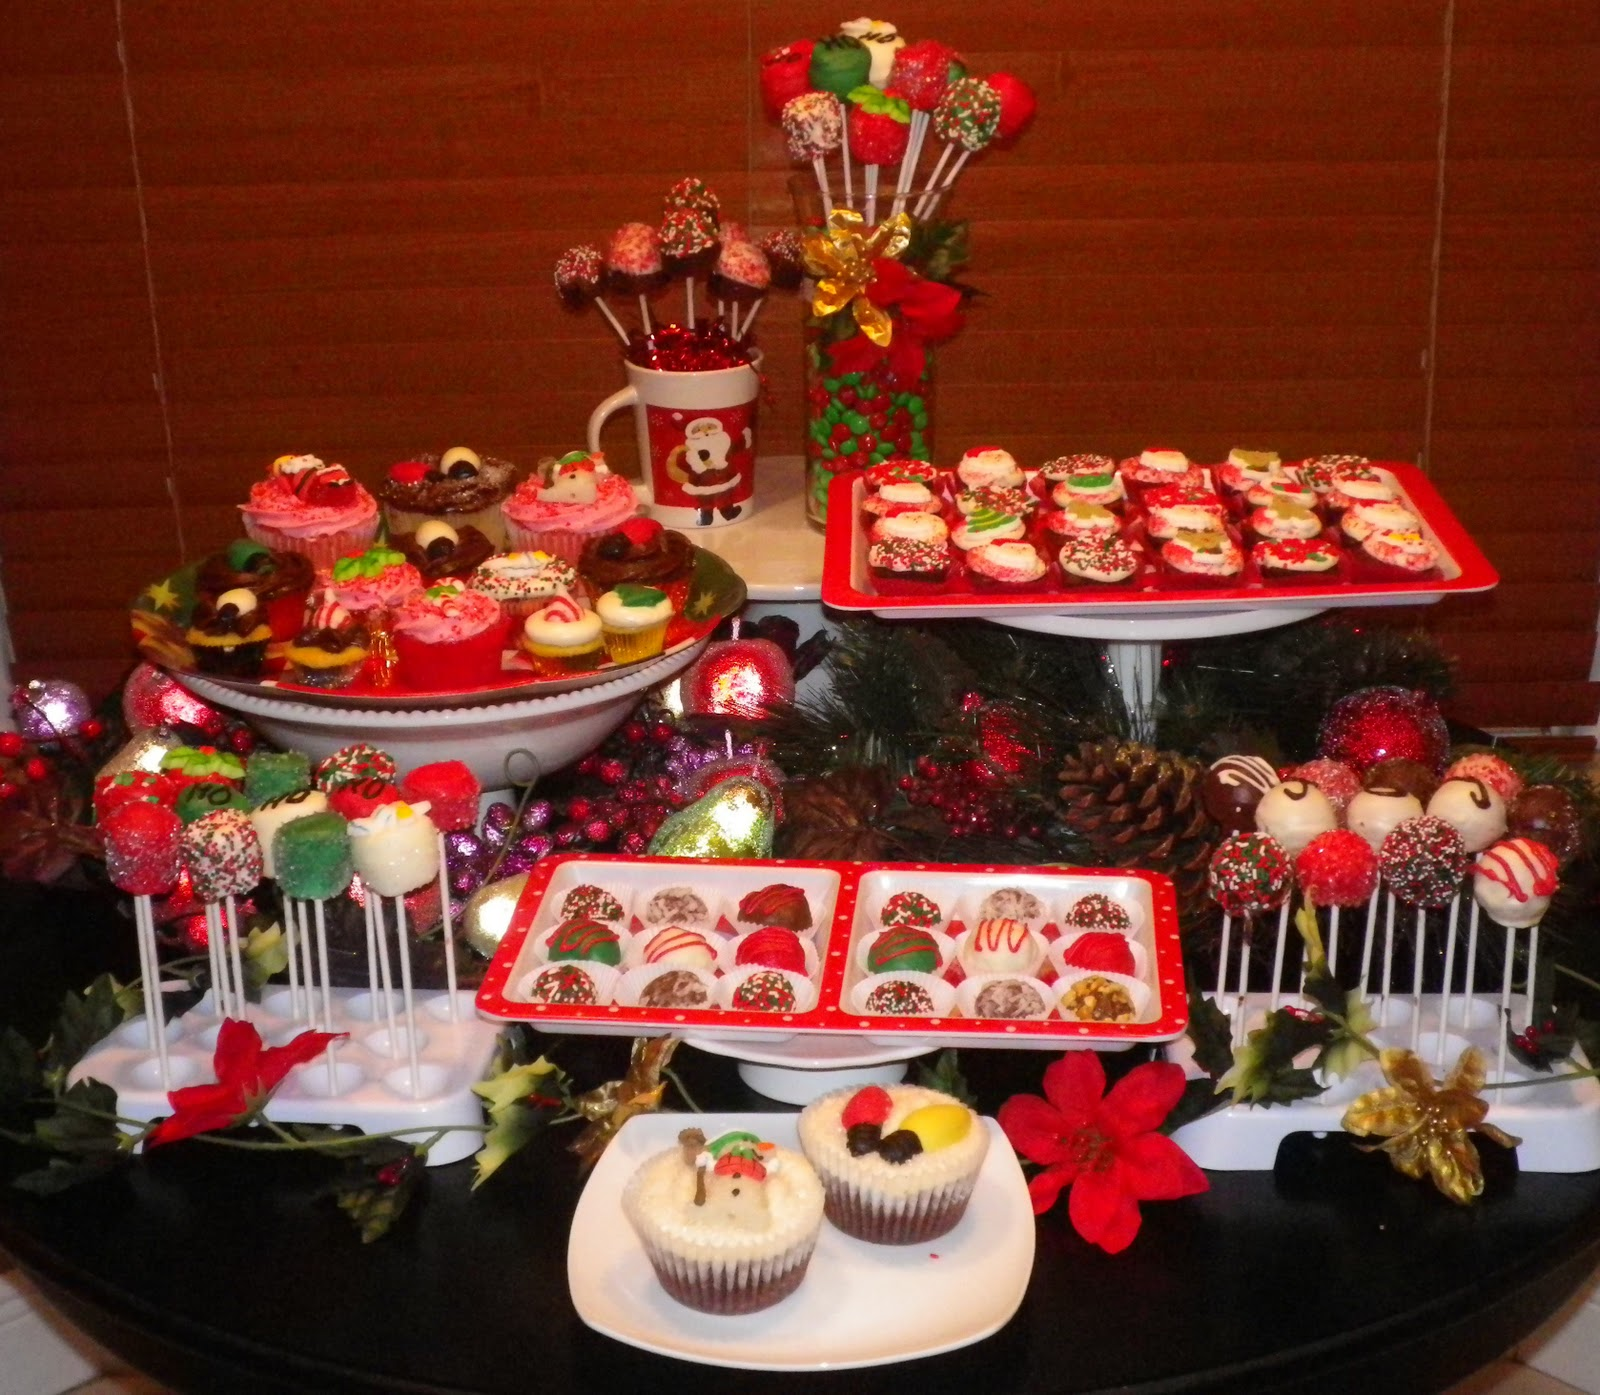 Christmas Dessert Table | Xmasblor